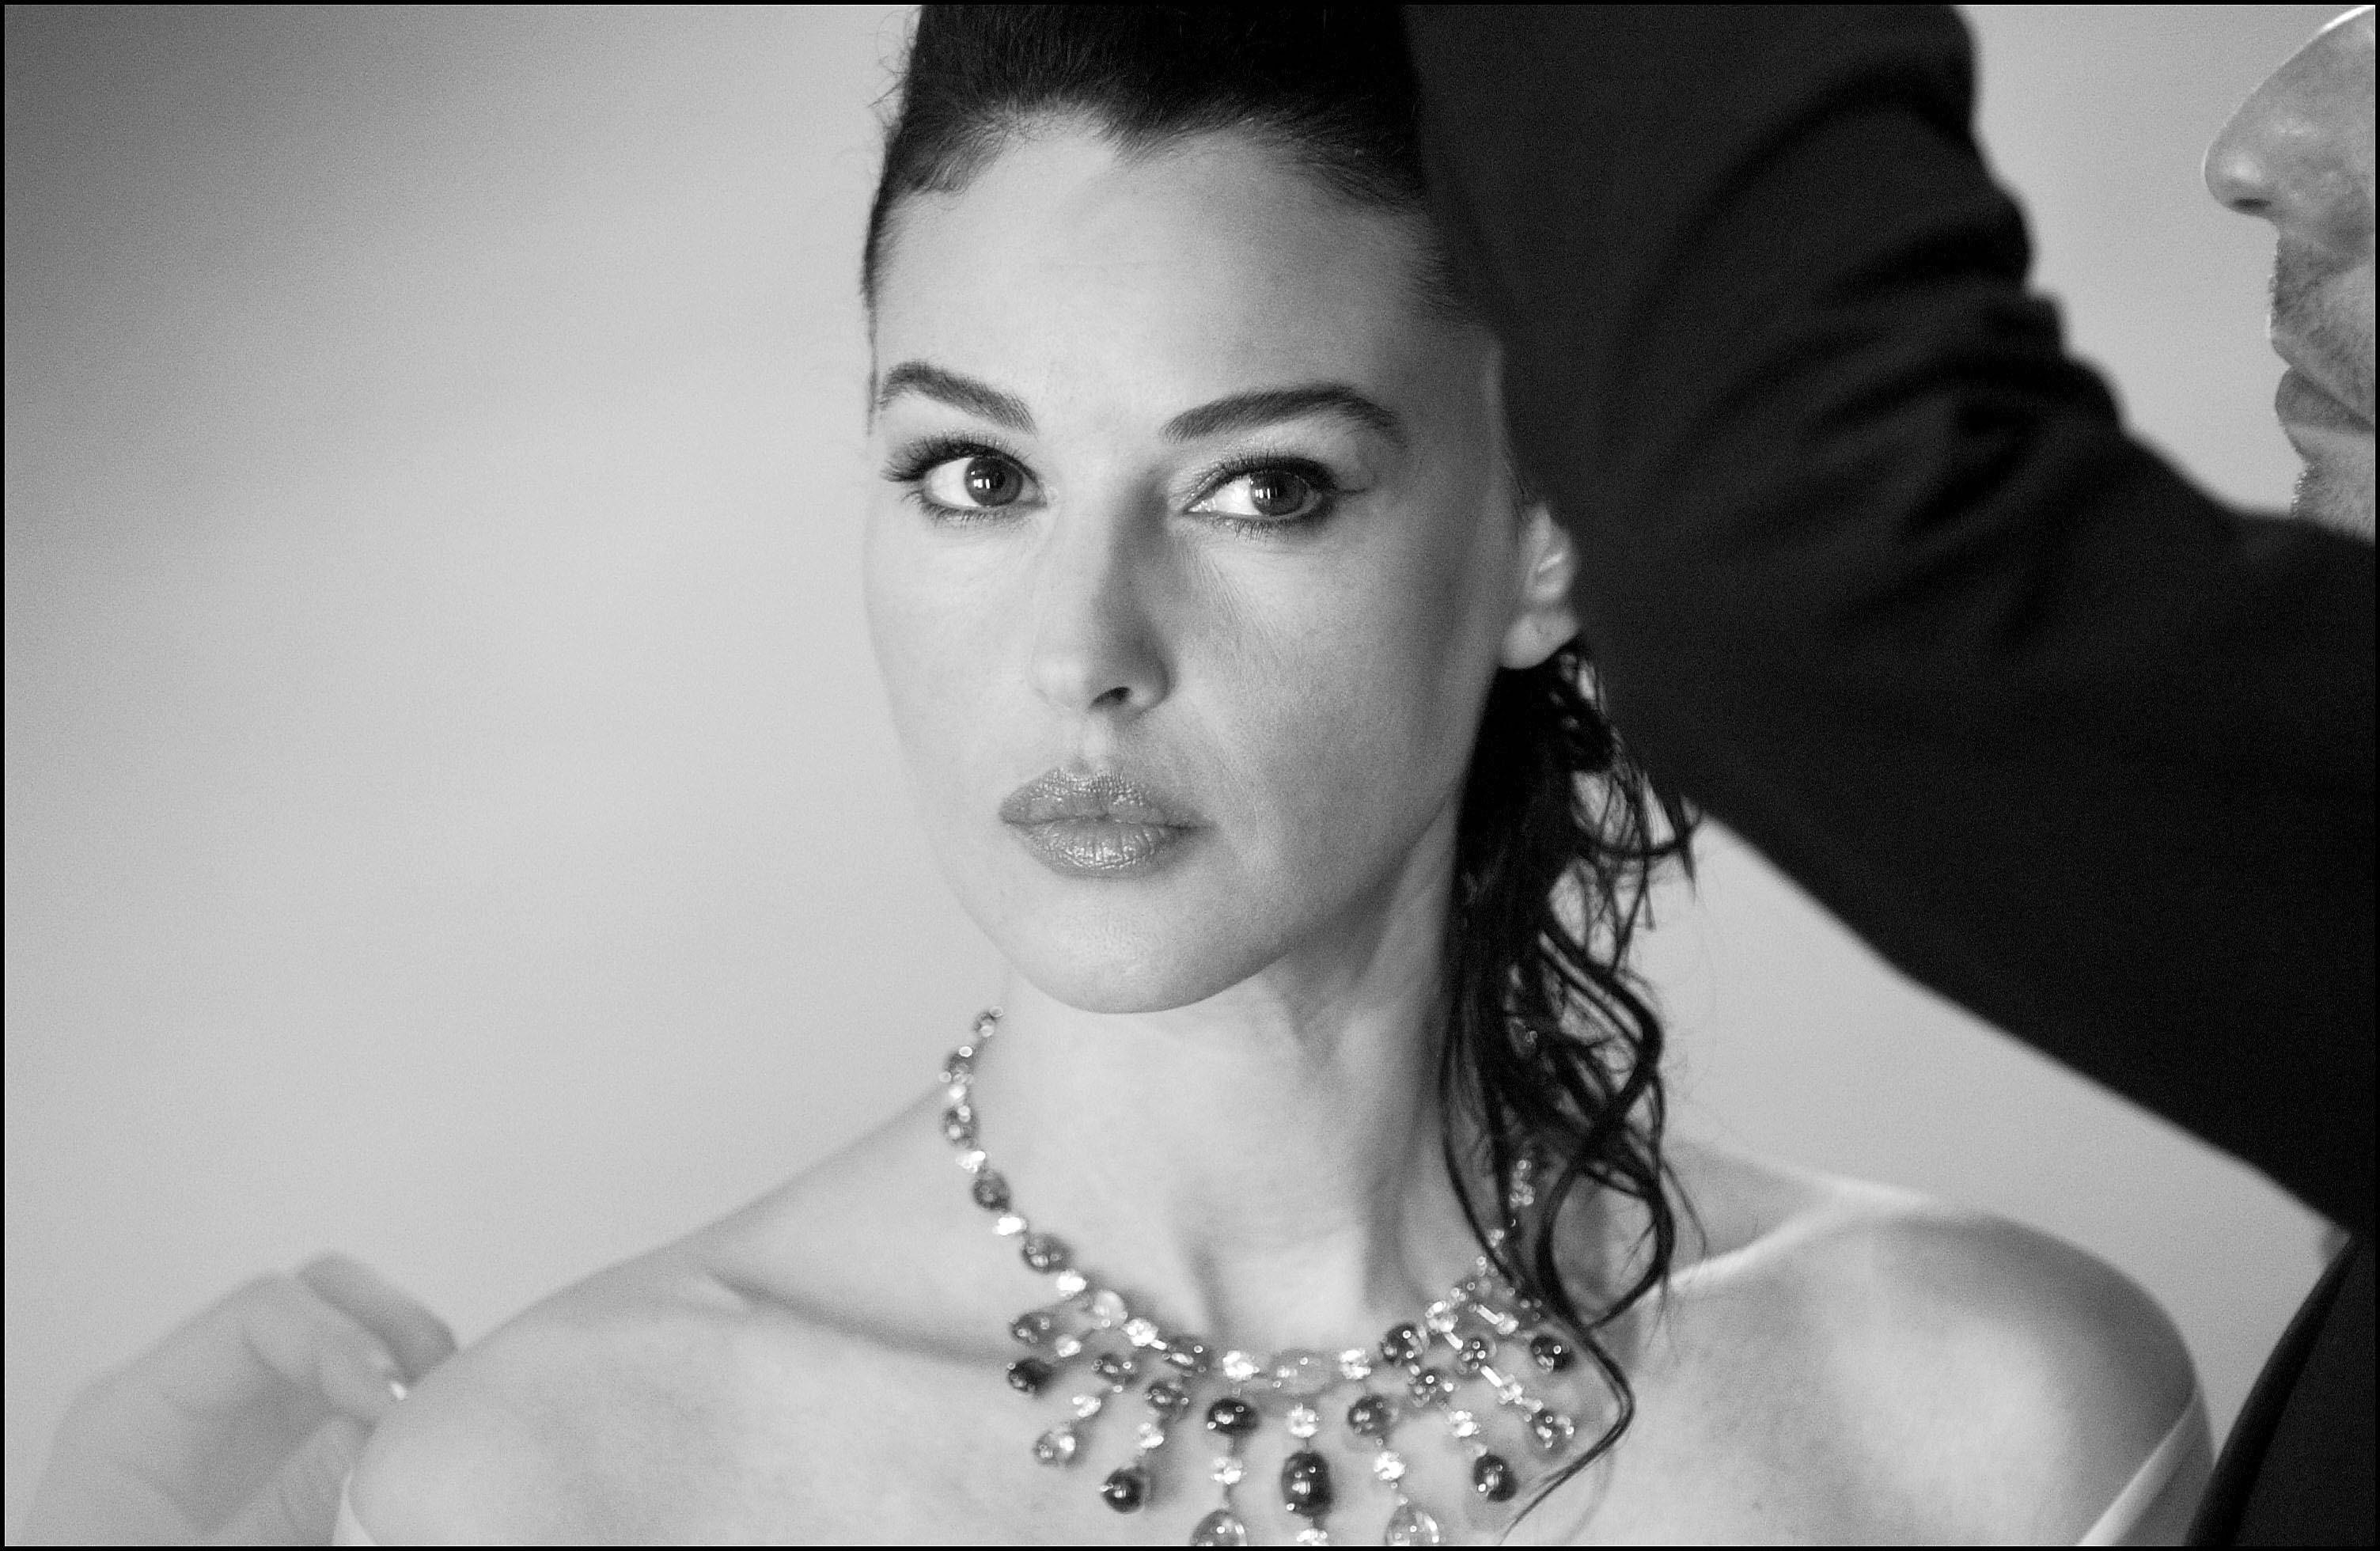 Monica Bellucci | The Review Mag Online Monica Bellucci